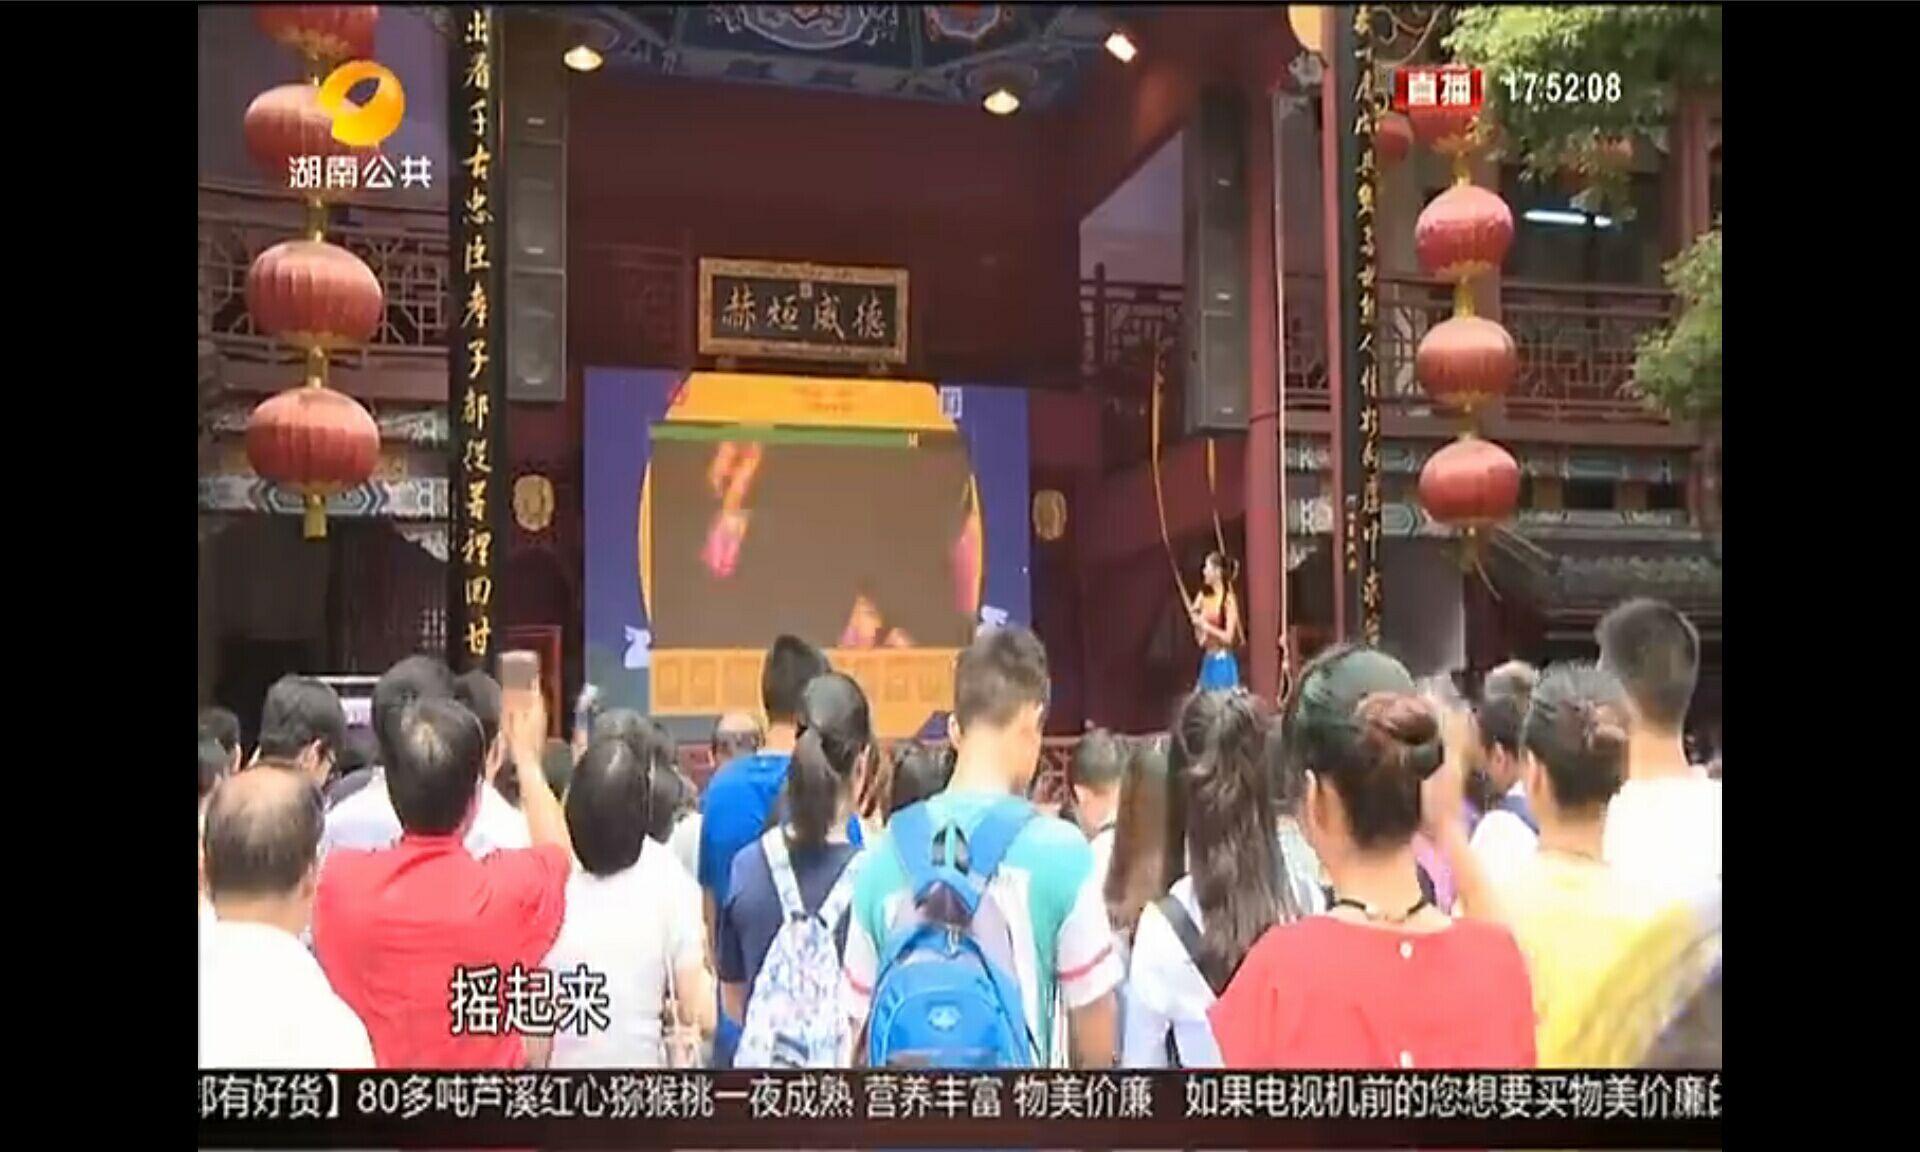 Hi现场微信大屏幕